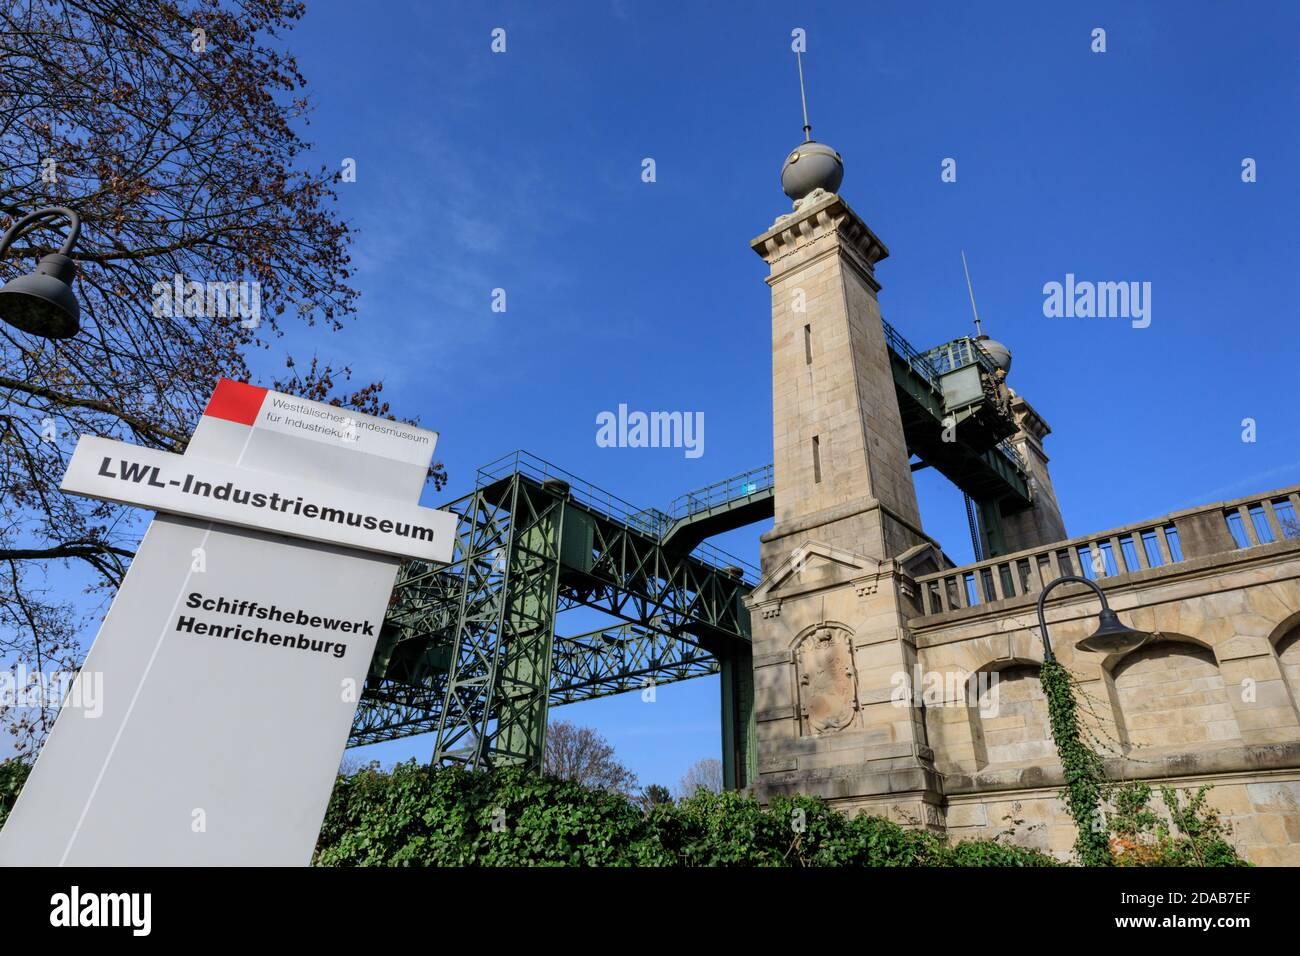 Henrichenburg boat lift, Industrial Heritage site by Dortmund Ems Canal, North Rhine-Westphalia, Germany Stock Photo